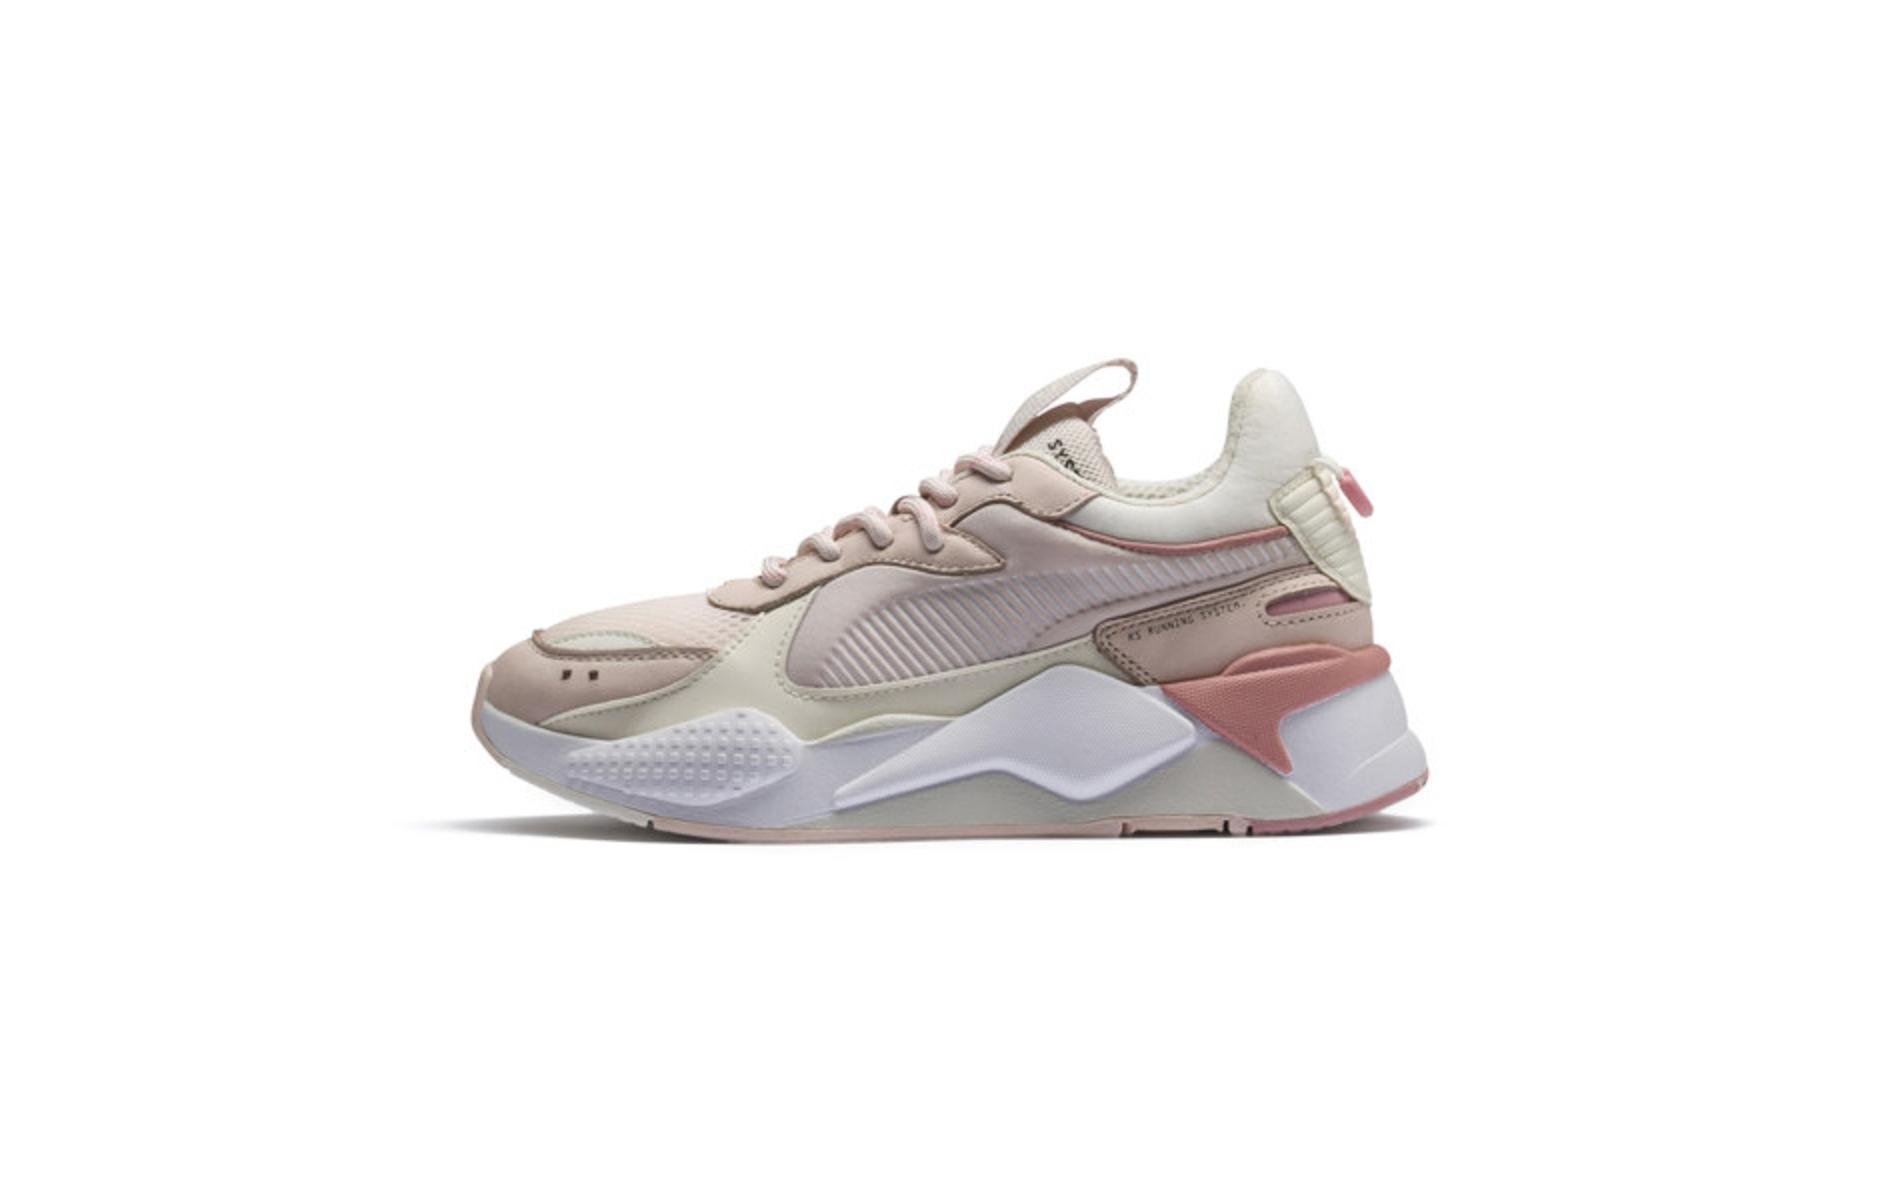 puma chaussure blanche rose rsx